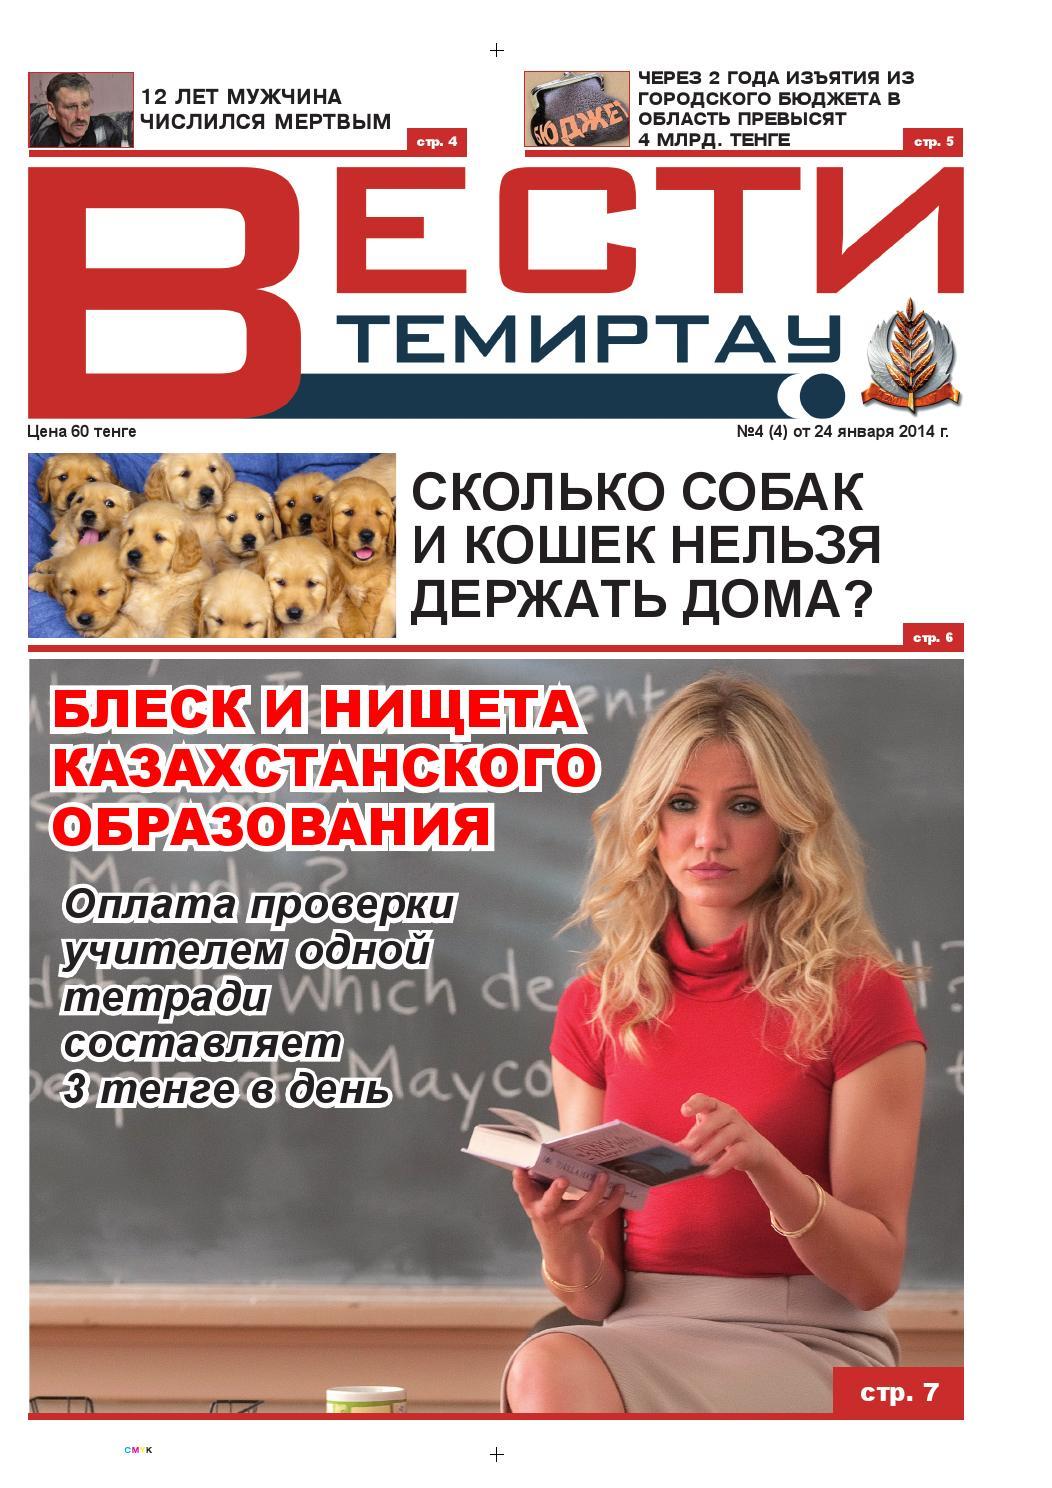 проститутки краснодара старше 50 лет